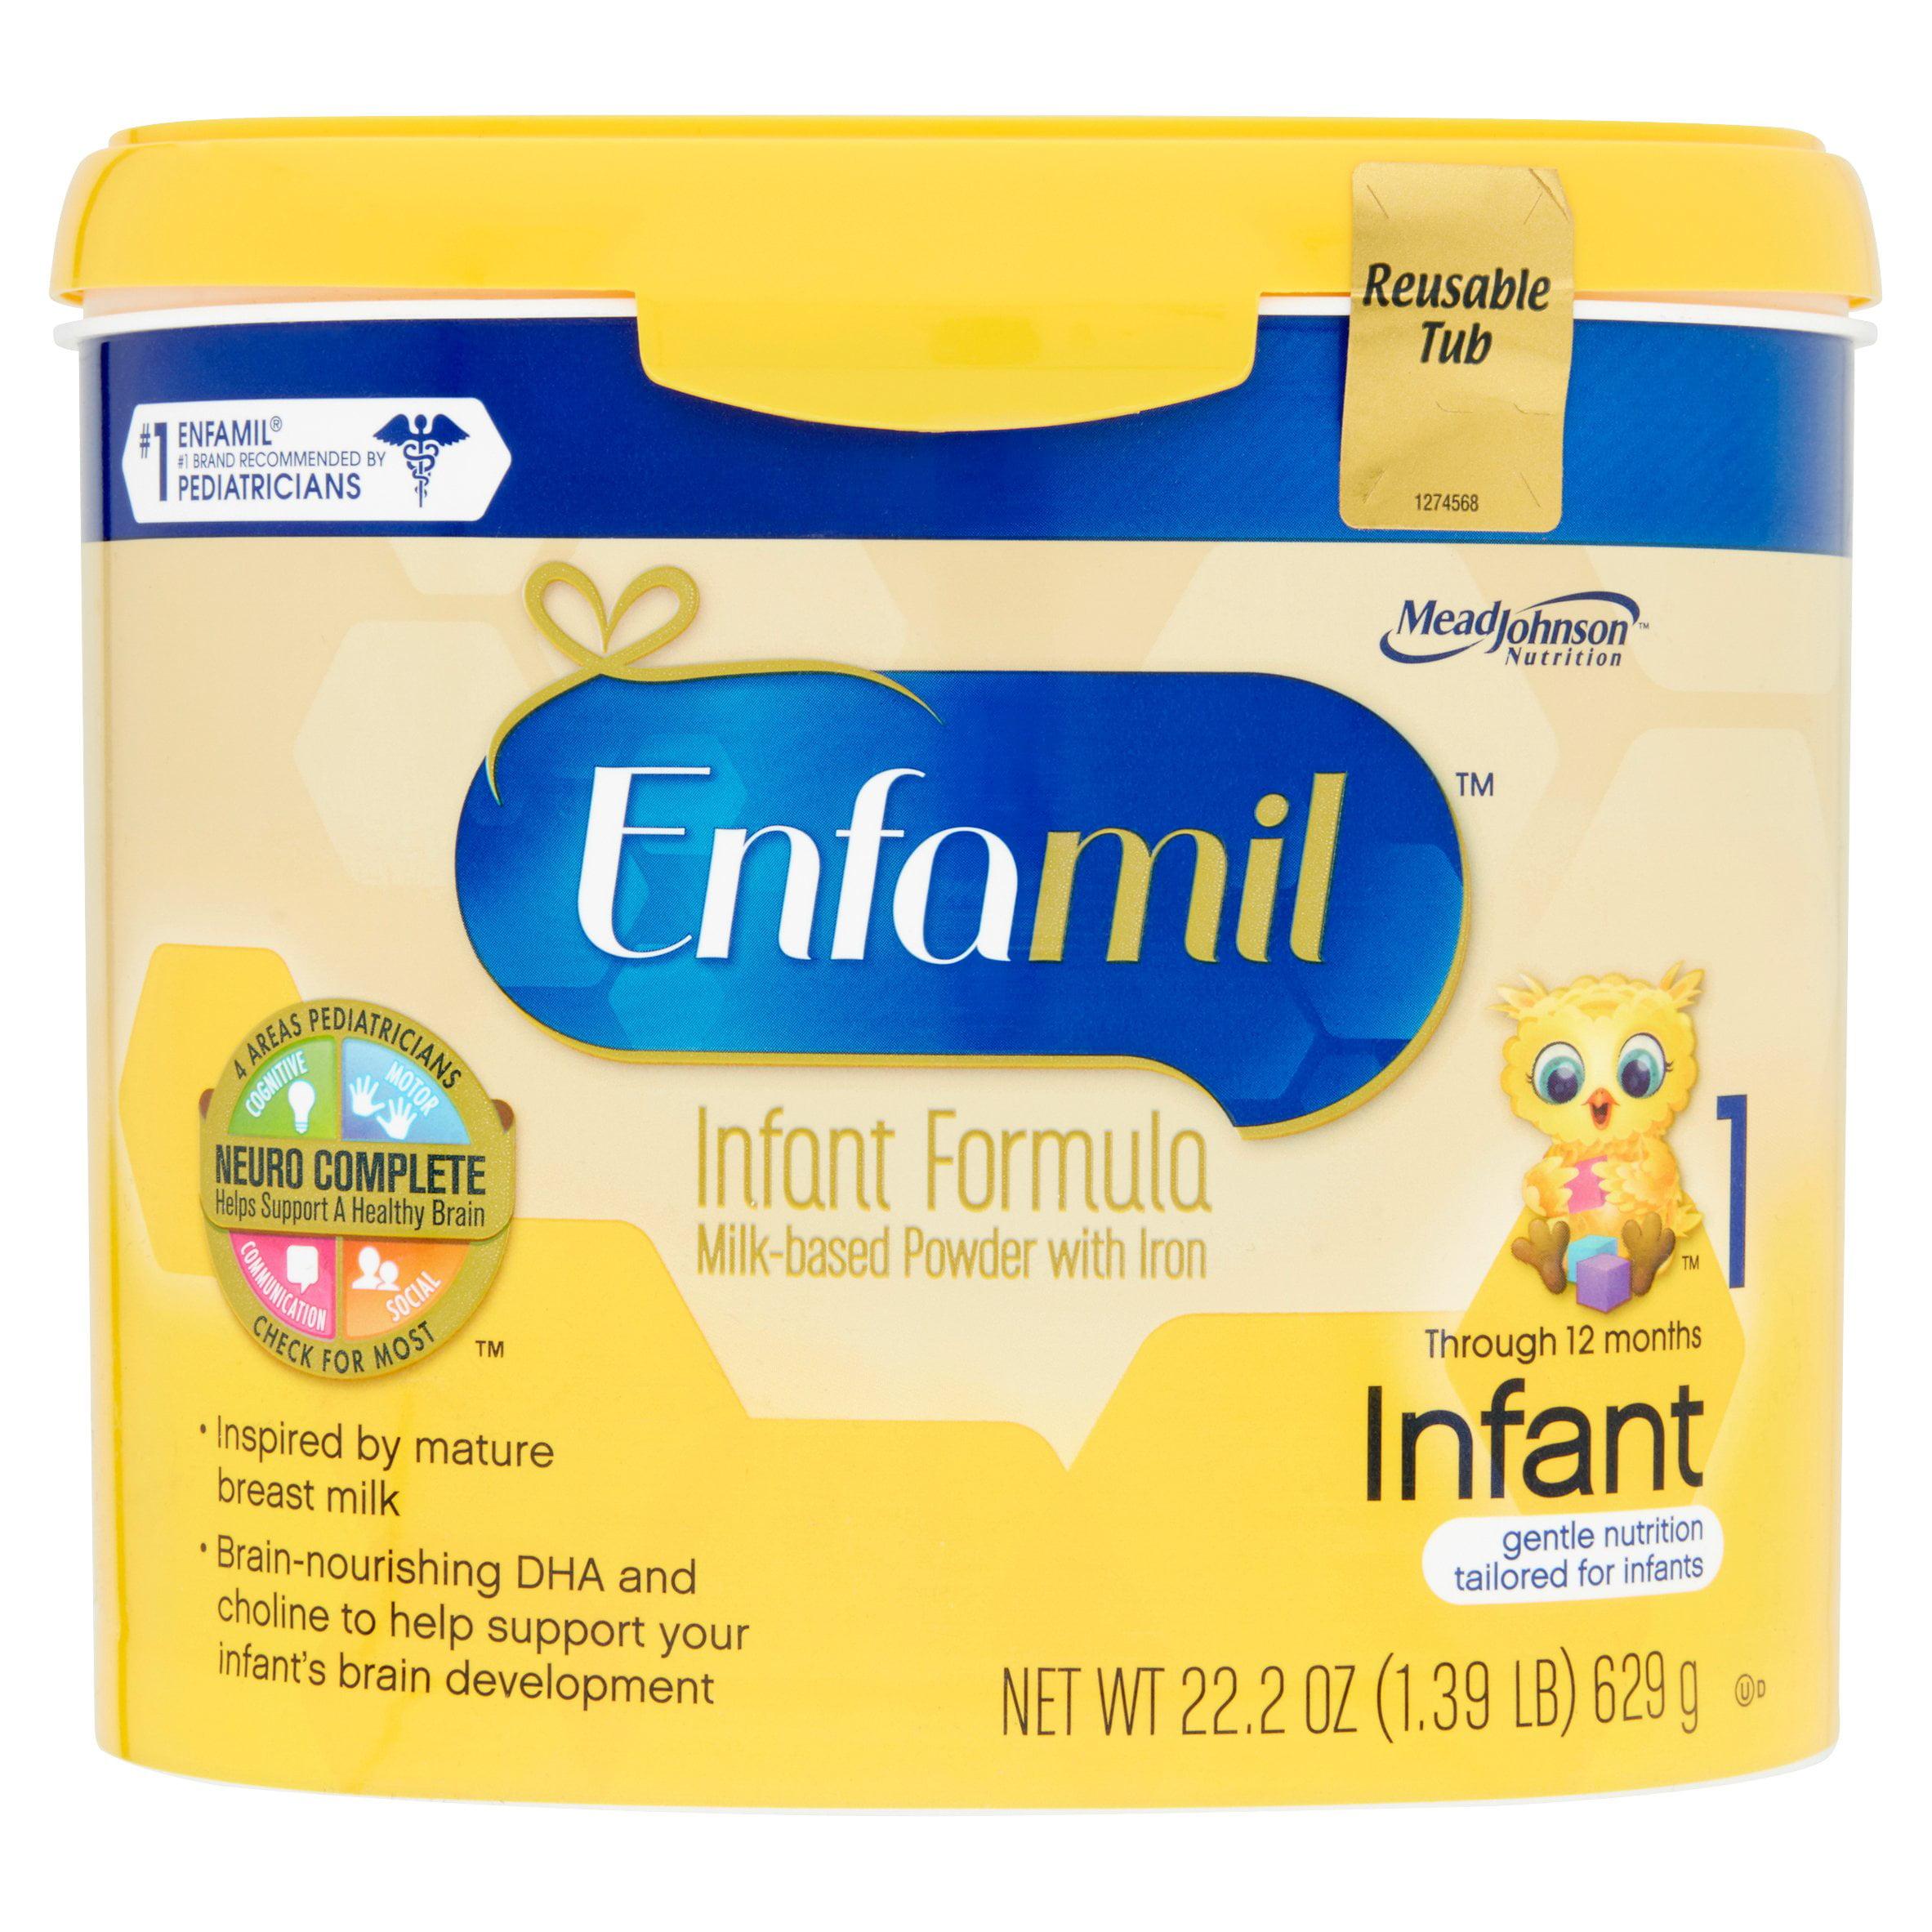 Enfamil PREMIUM Infant Formula, Powder 22.2 Ounce Tub, 6 Count by Enfamil